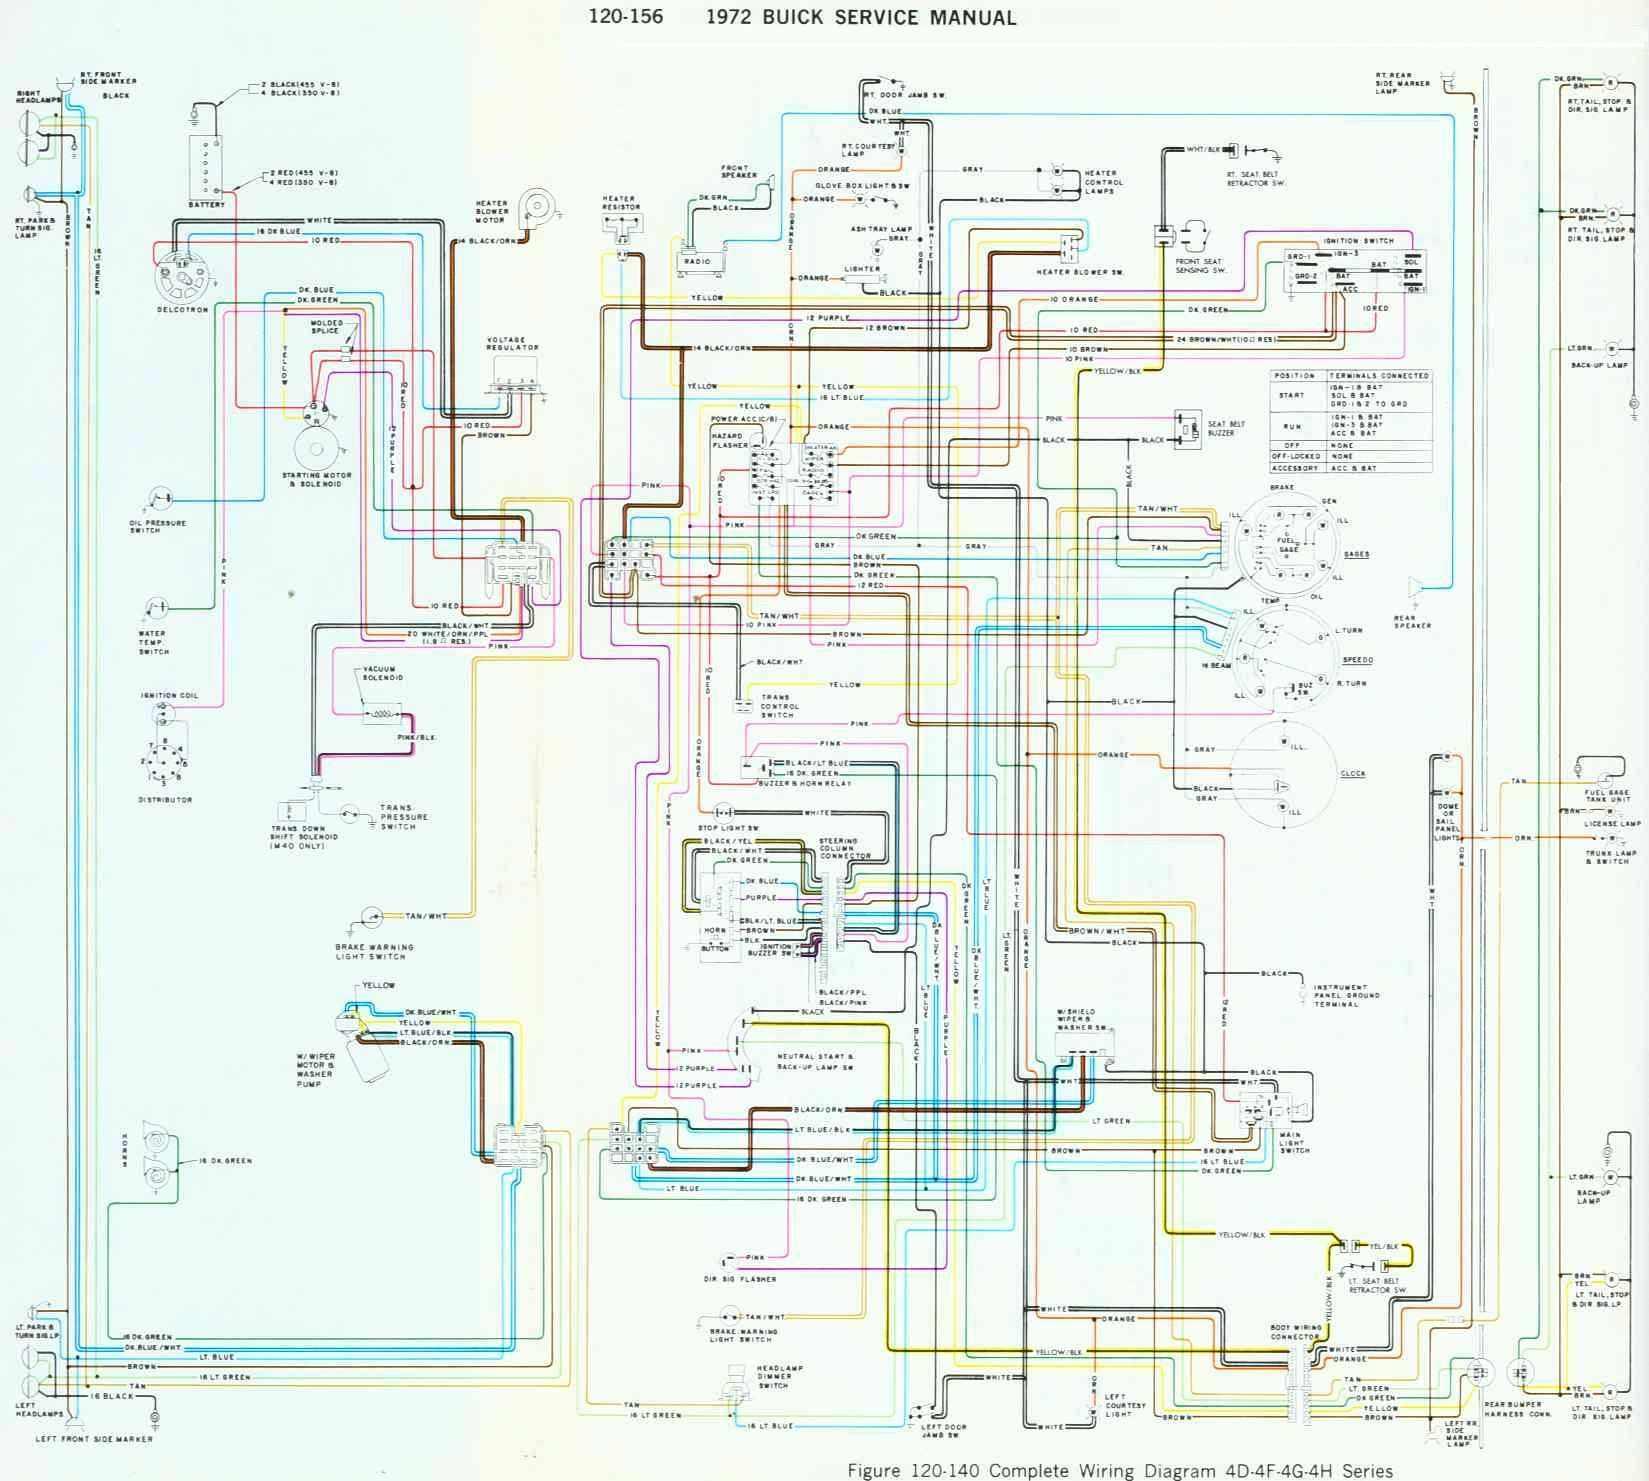 buick car manuals wiring diagrams pdf fault codes 1965 buick wildcat 1969 buick wildcat [ 1649 x 1481 Pixel ]